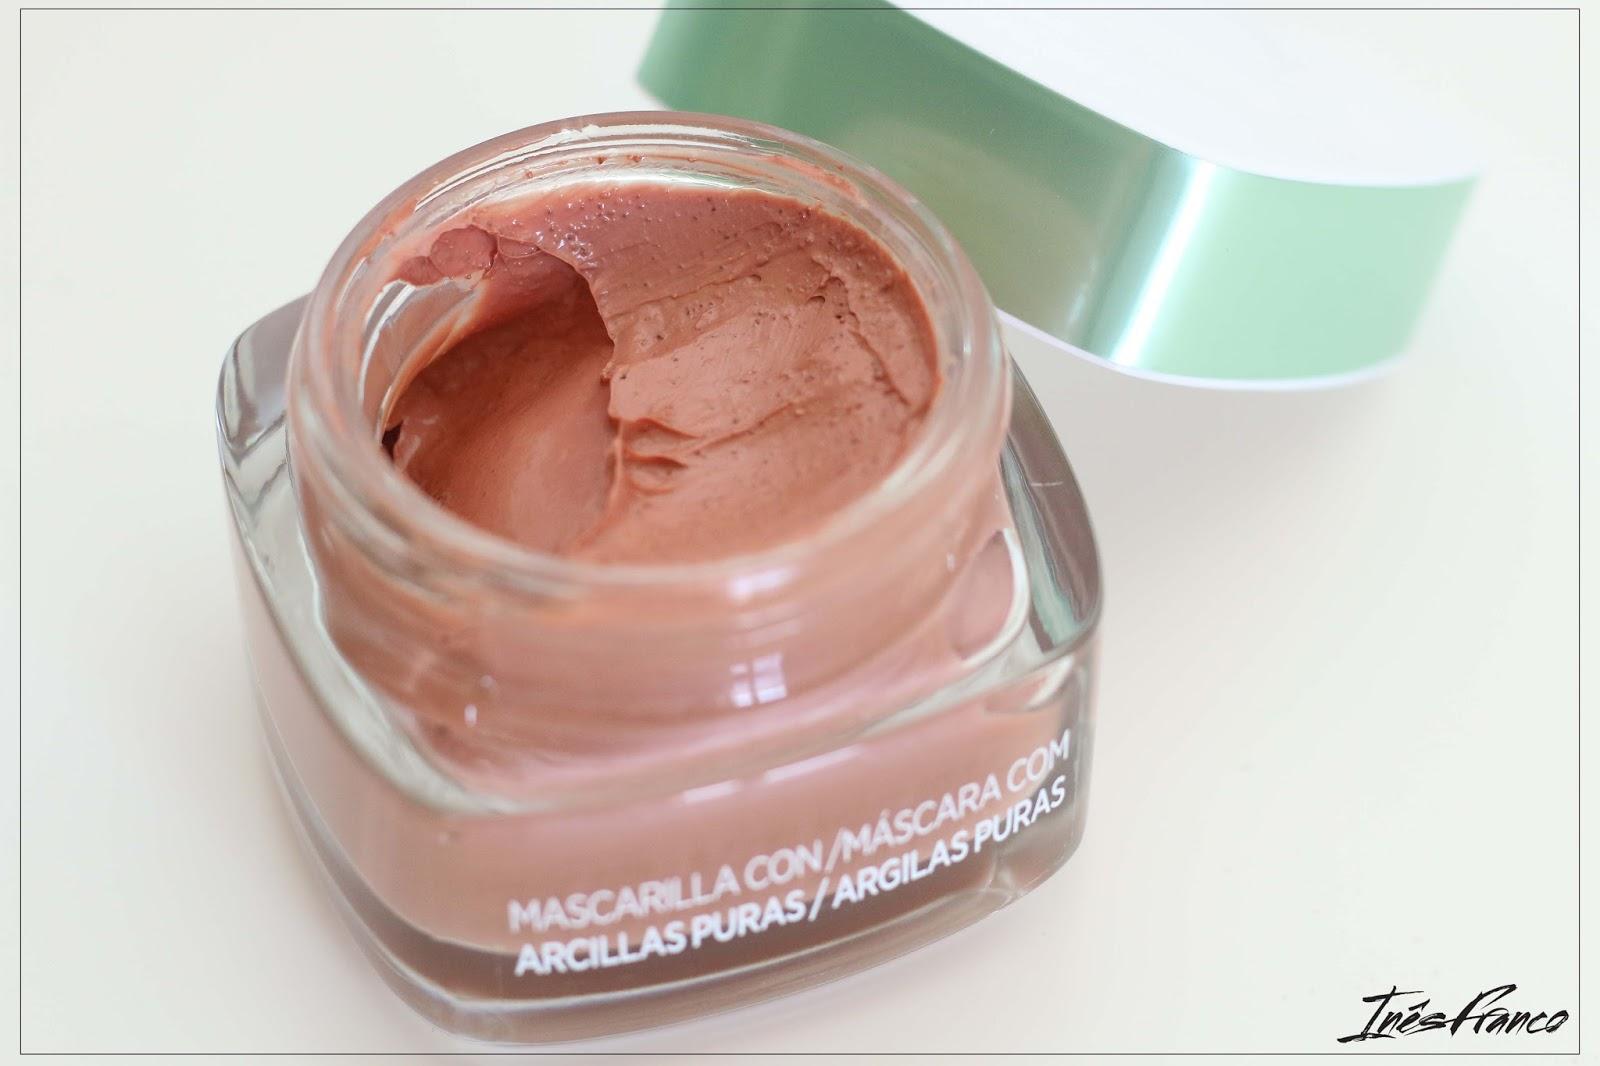 Mascara loreal argila verde